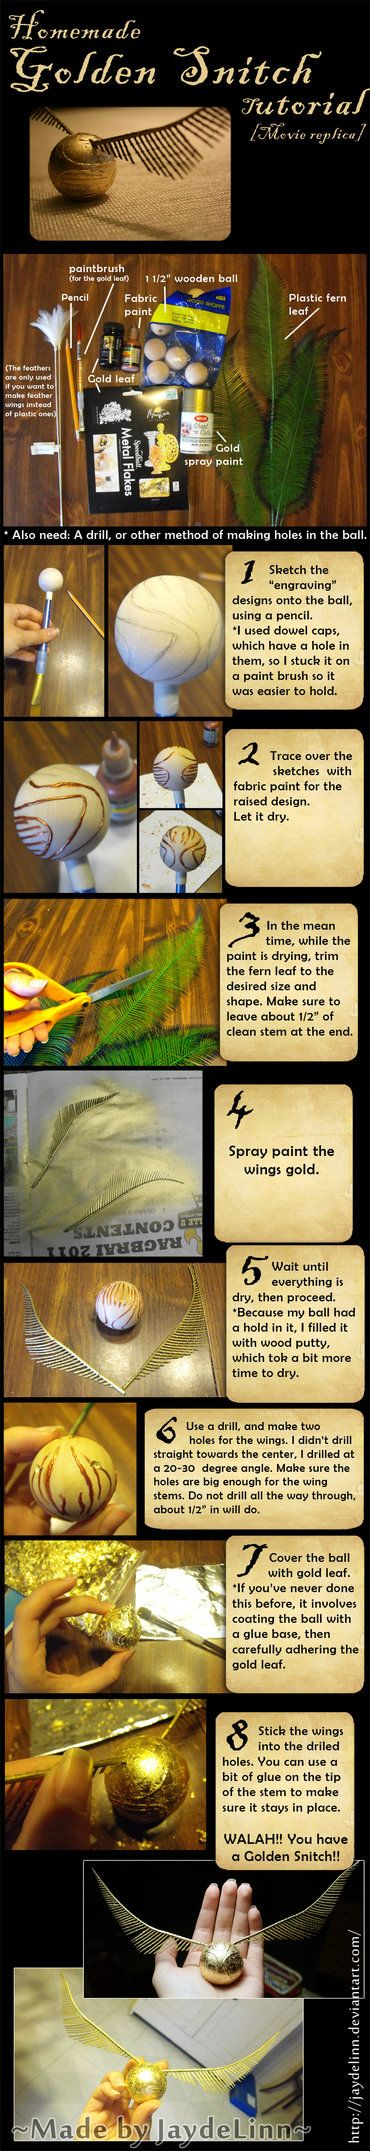 Homemade Golden Snitch Tutorial.